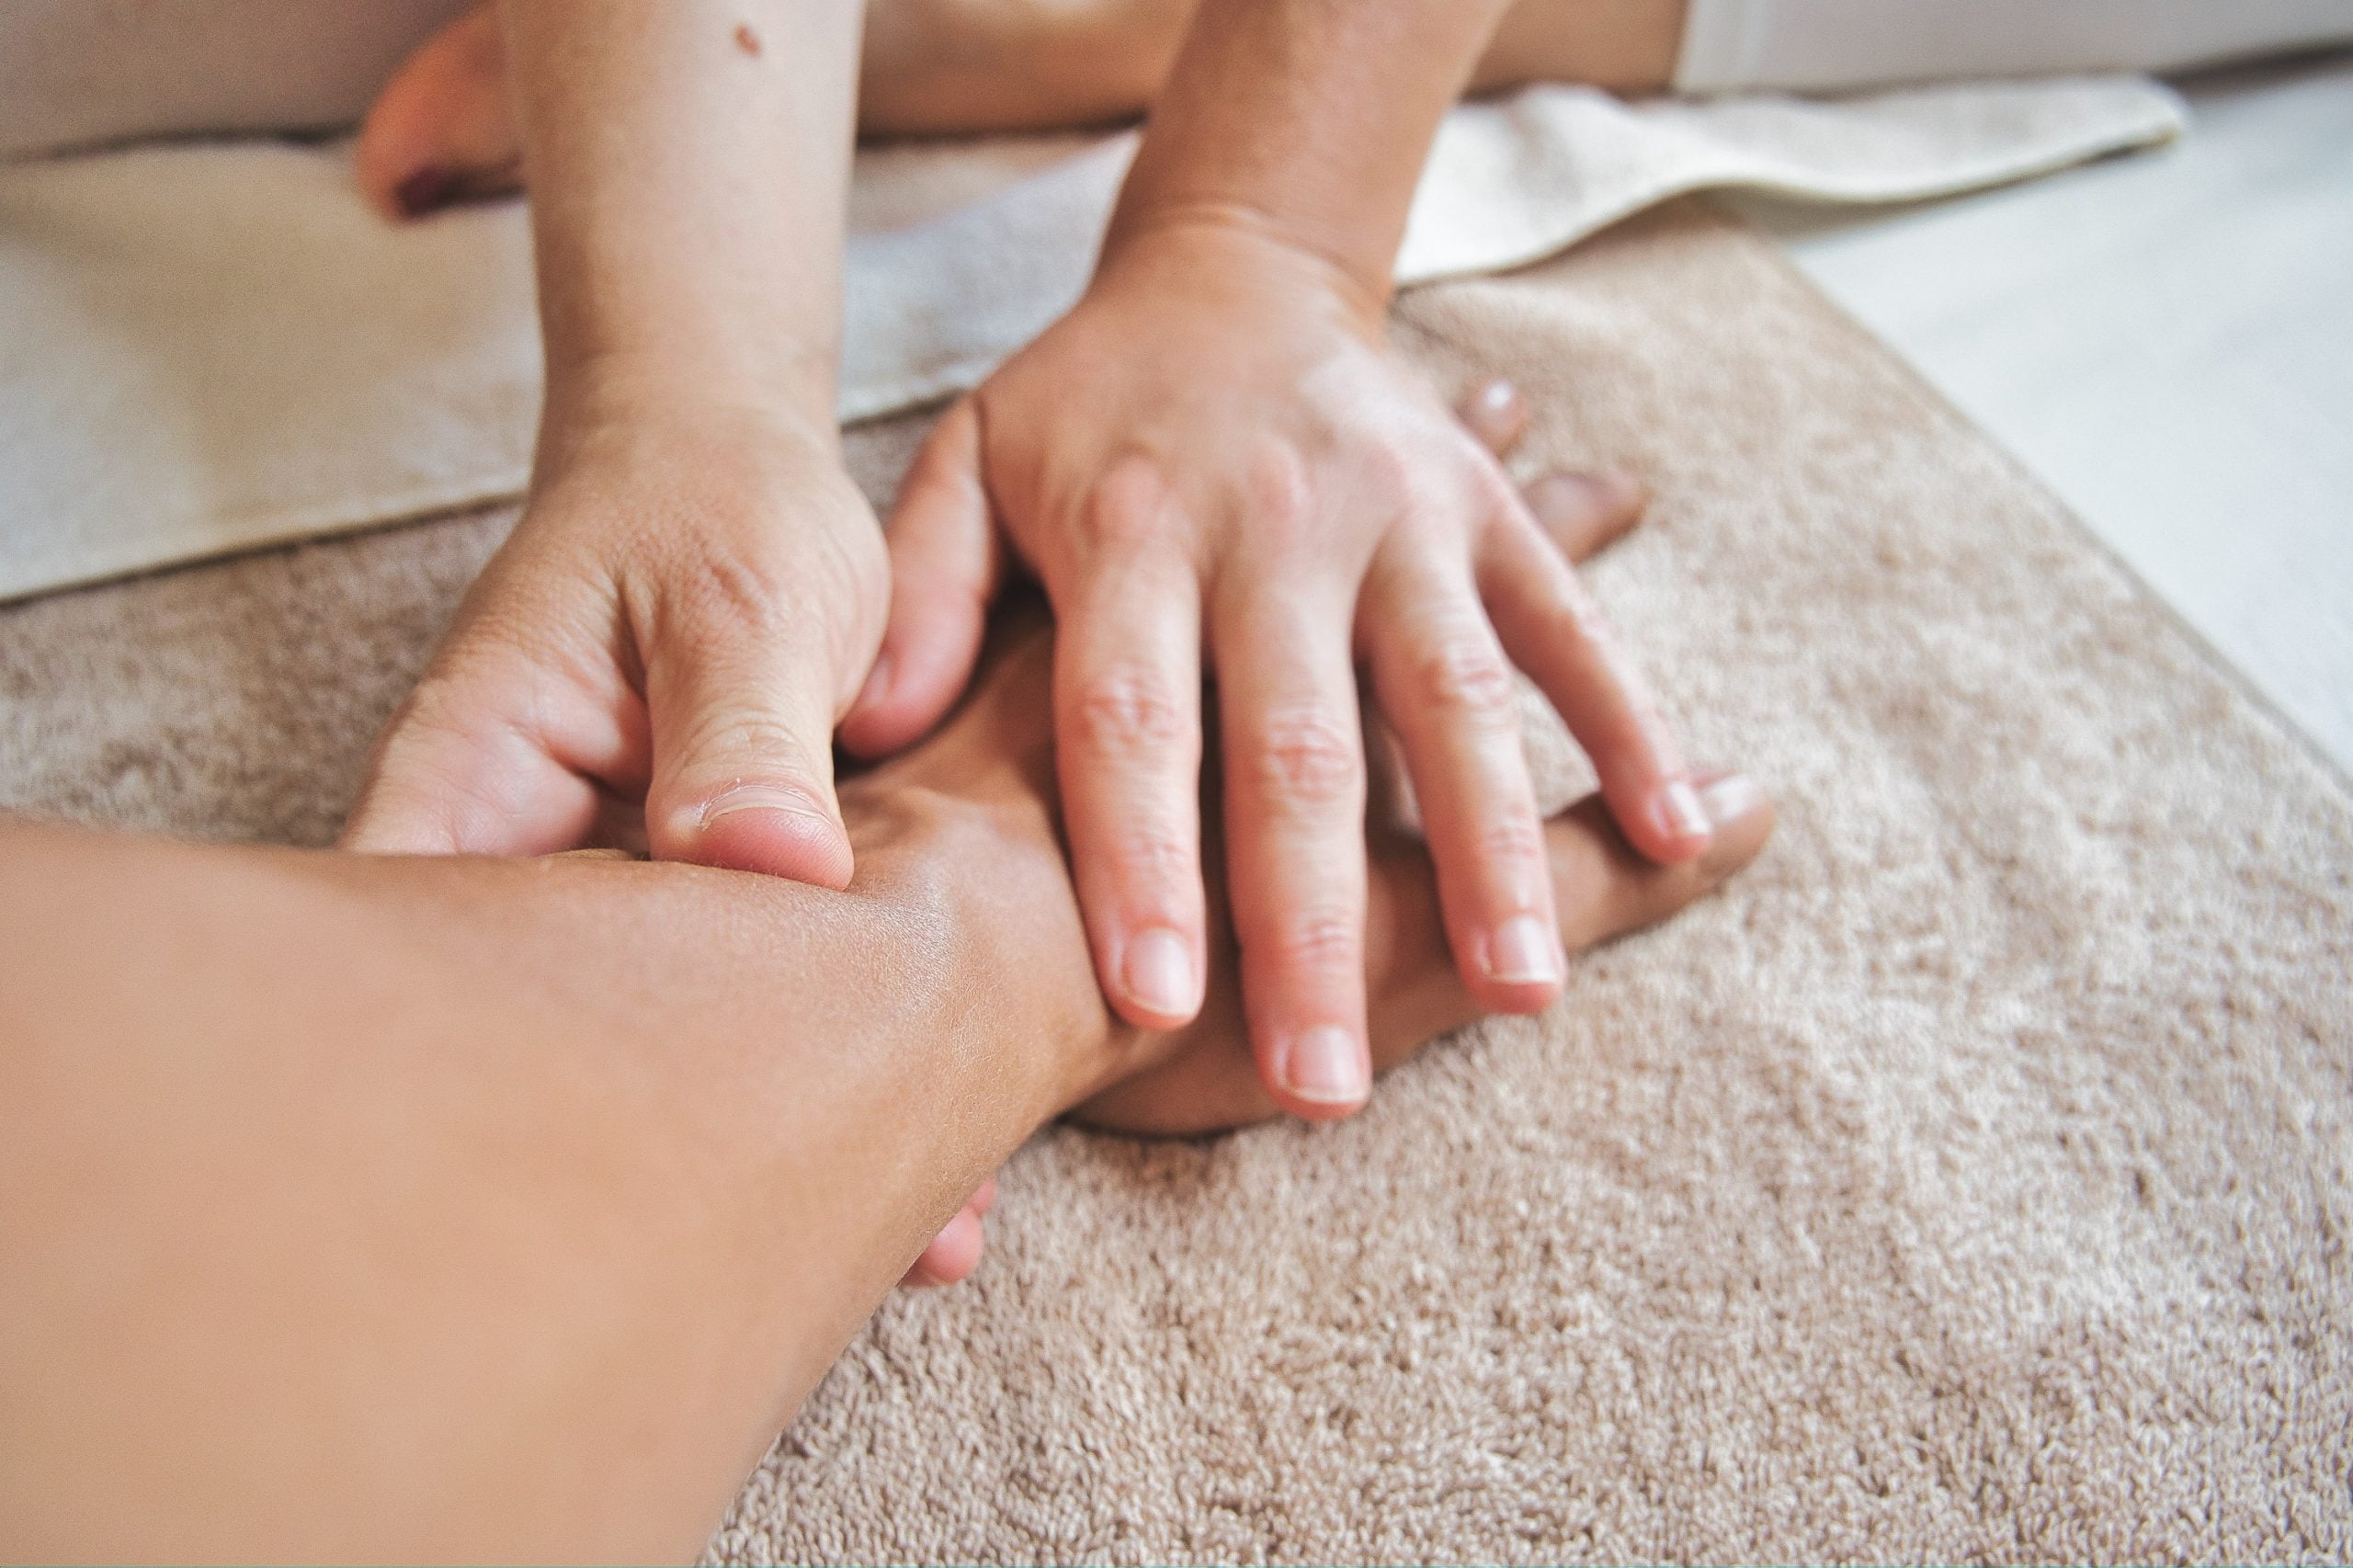 conscious-design-ubeslMfS1lk-unsplash hand massage